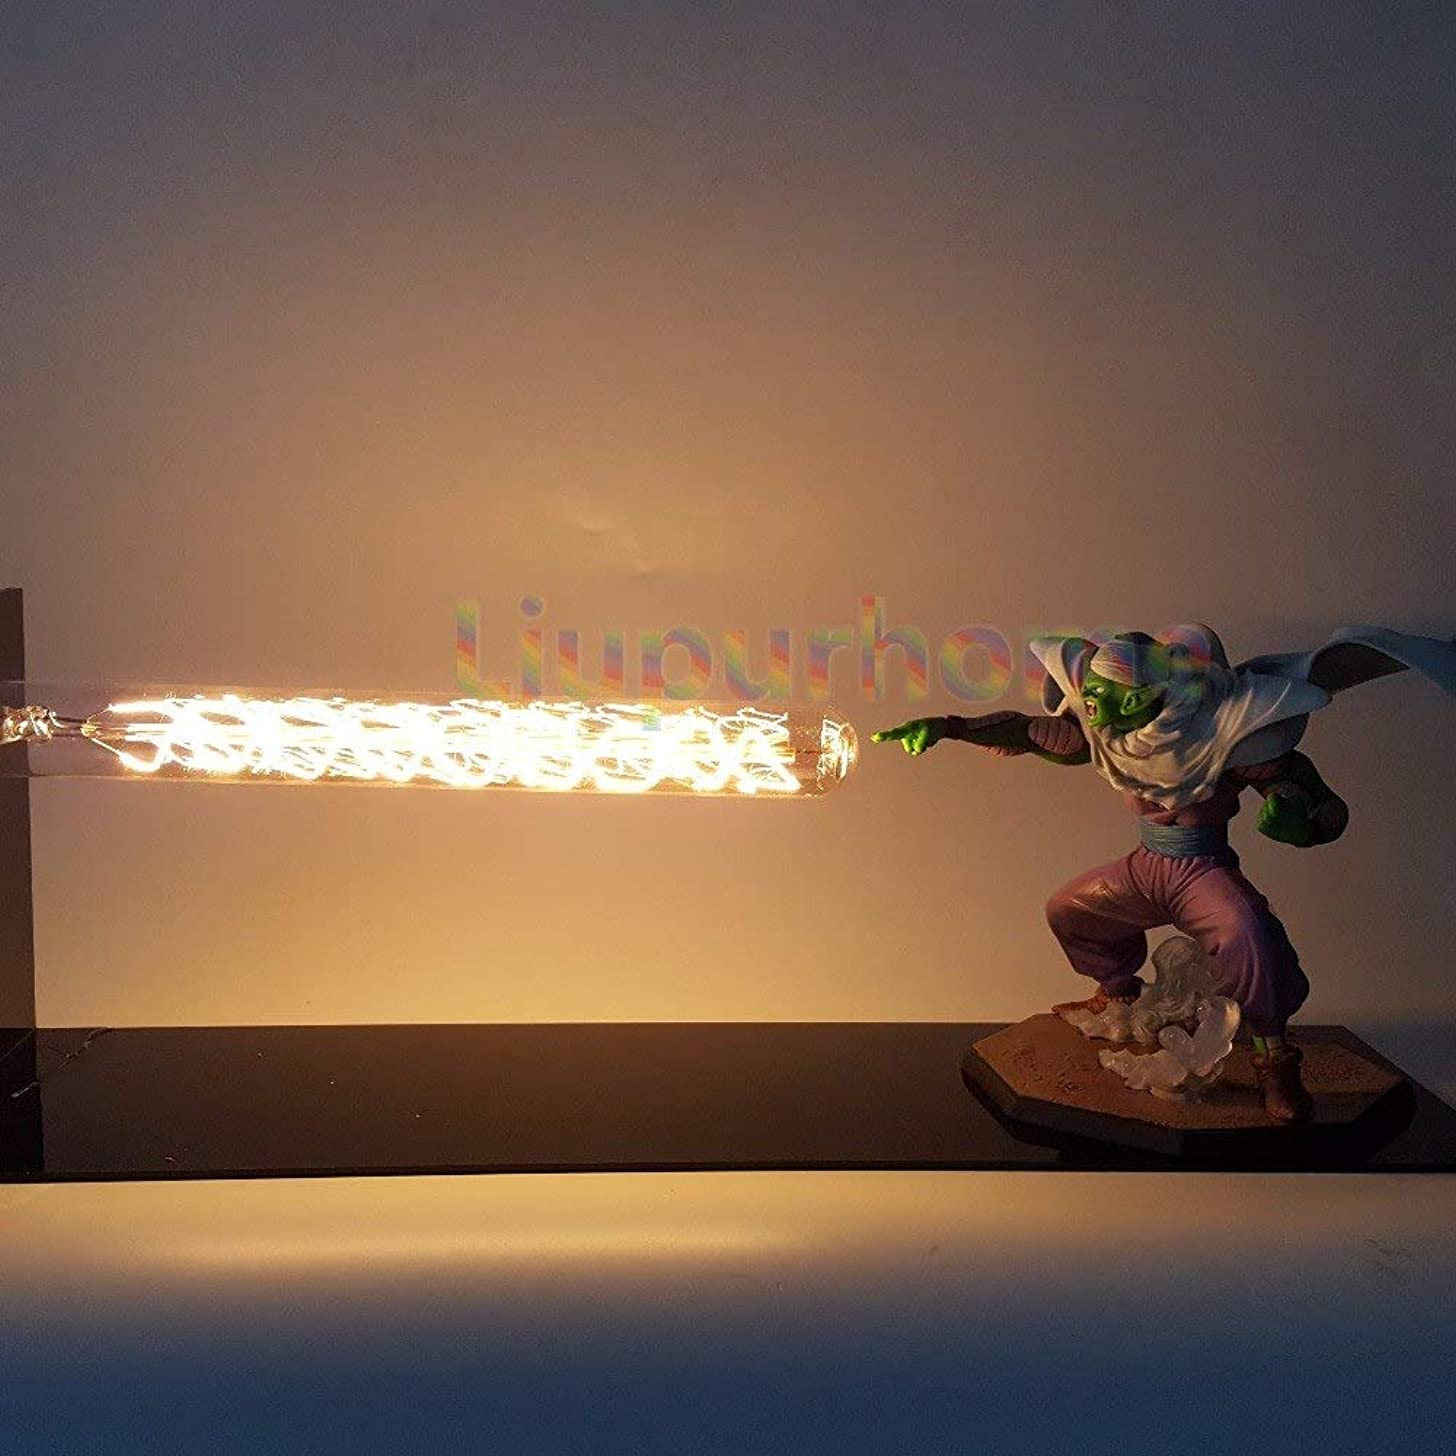 Special Beam Cannon Dragon Ball Z Piccolo Led Night Lights Anime Dragon Ball Super DBZ Super Saiyan Led Bulb Lamp